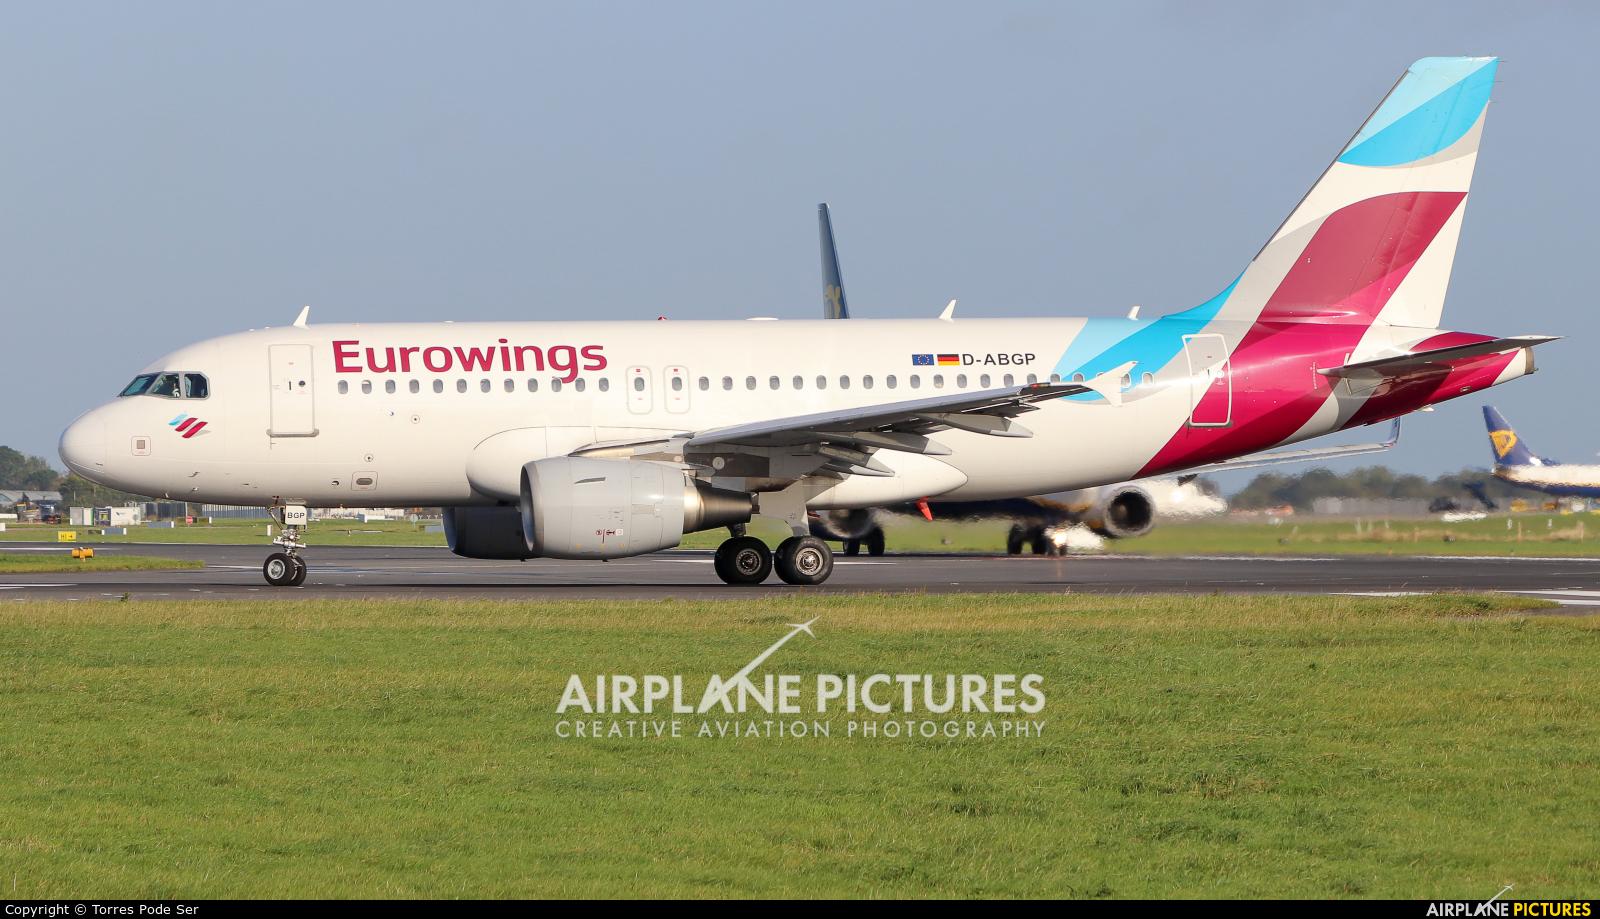 Eurowings D-ABGP aircraft at Dublin